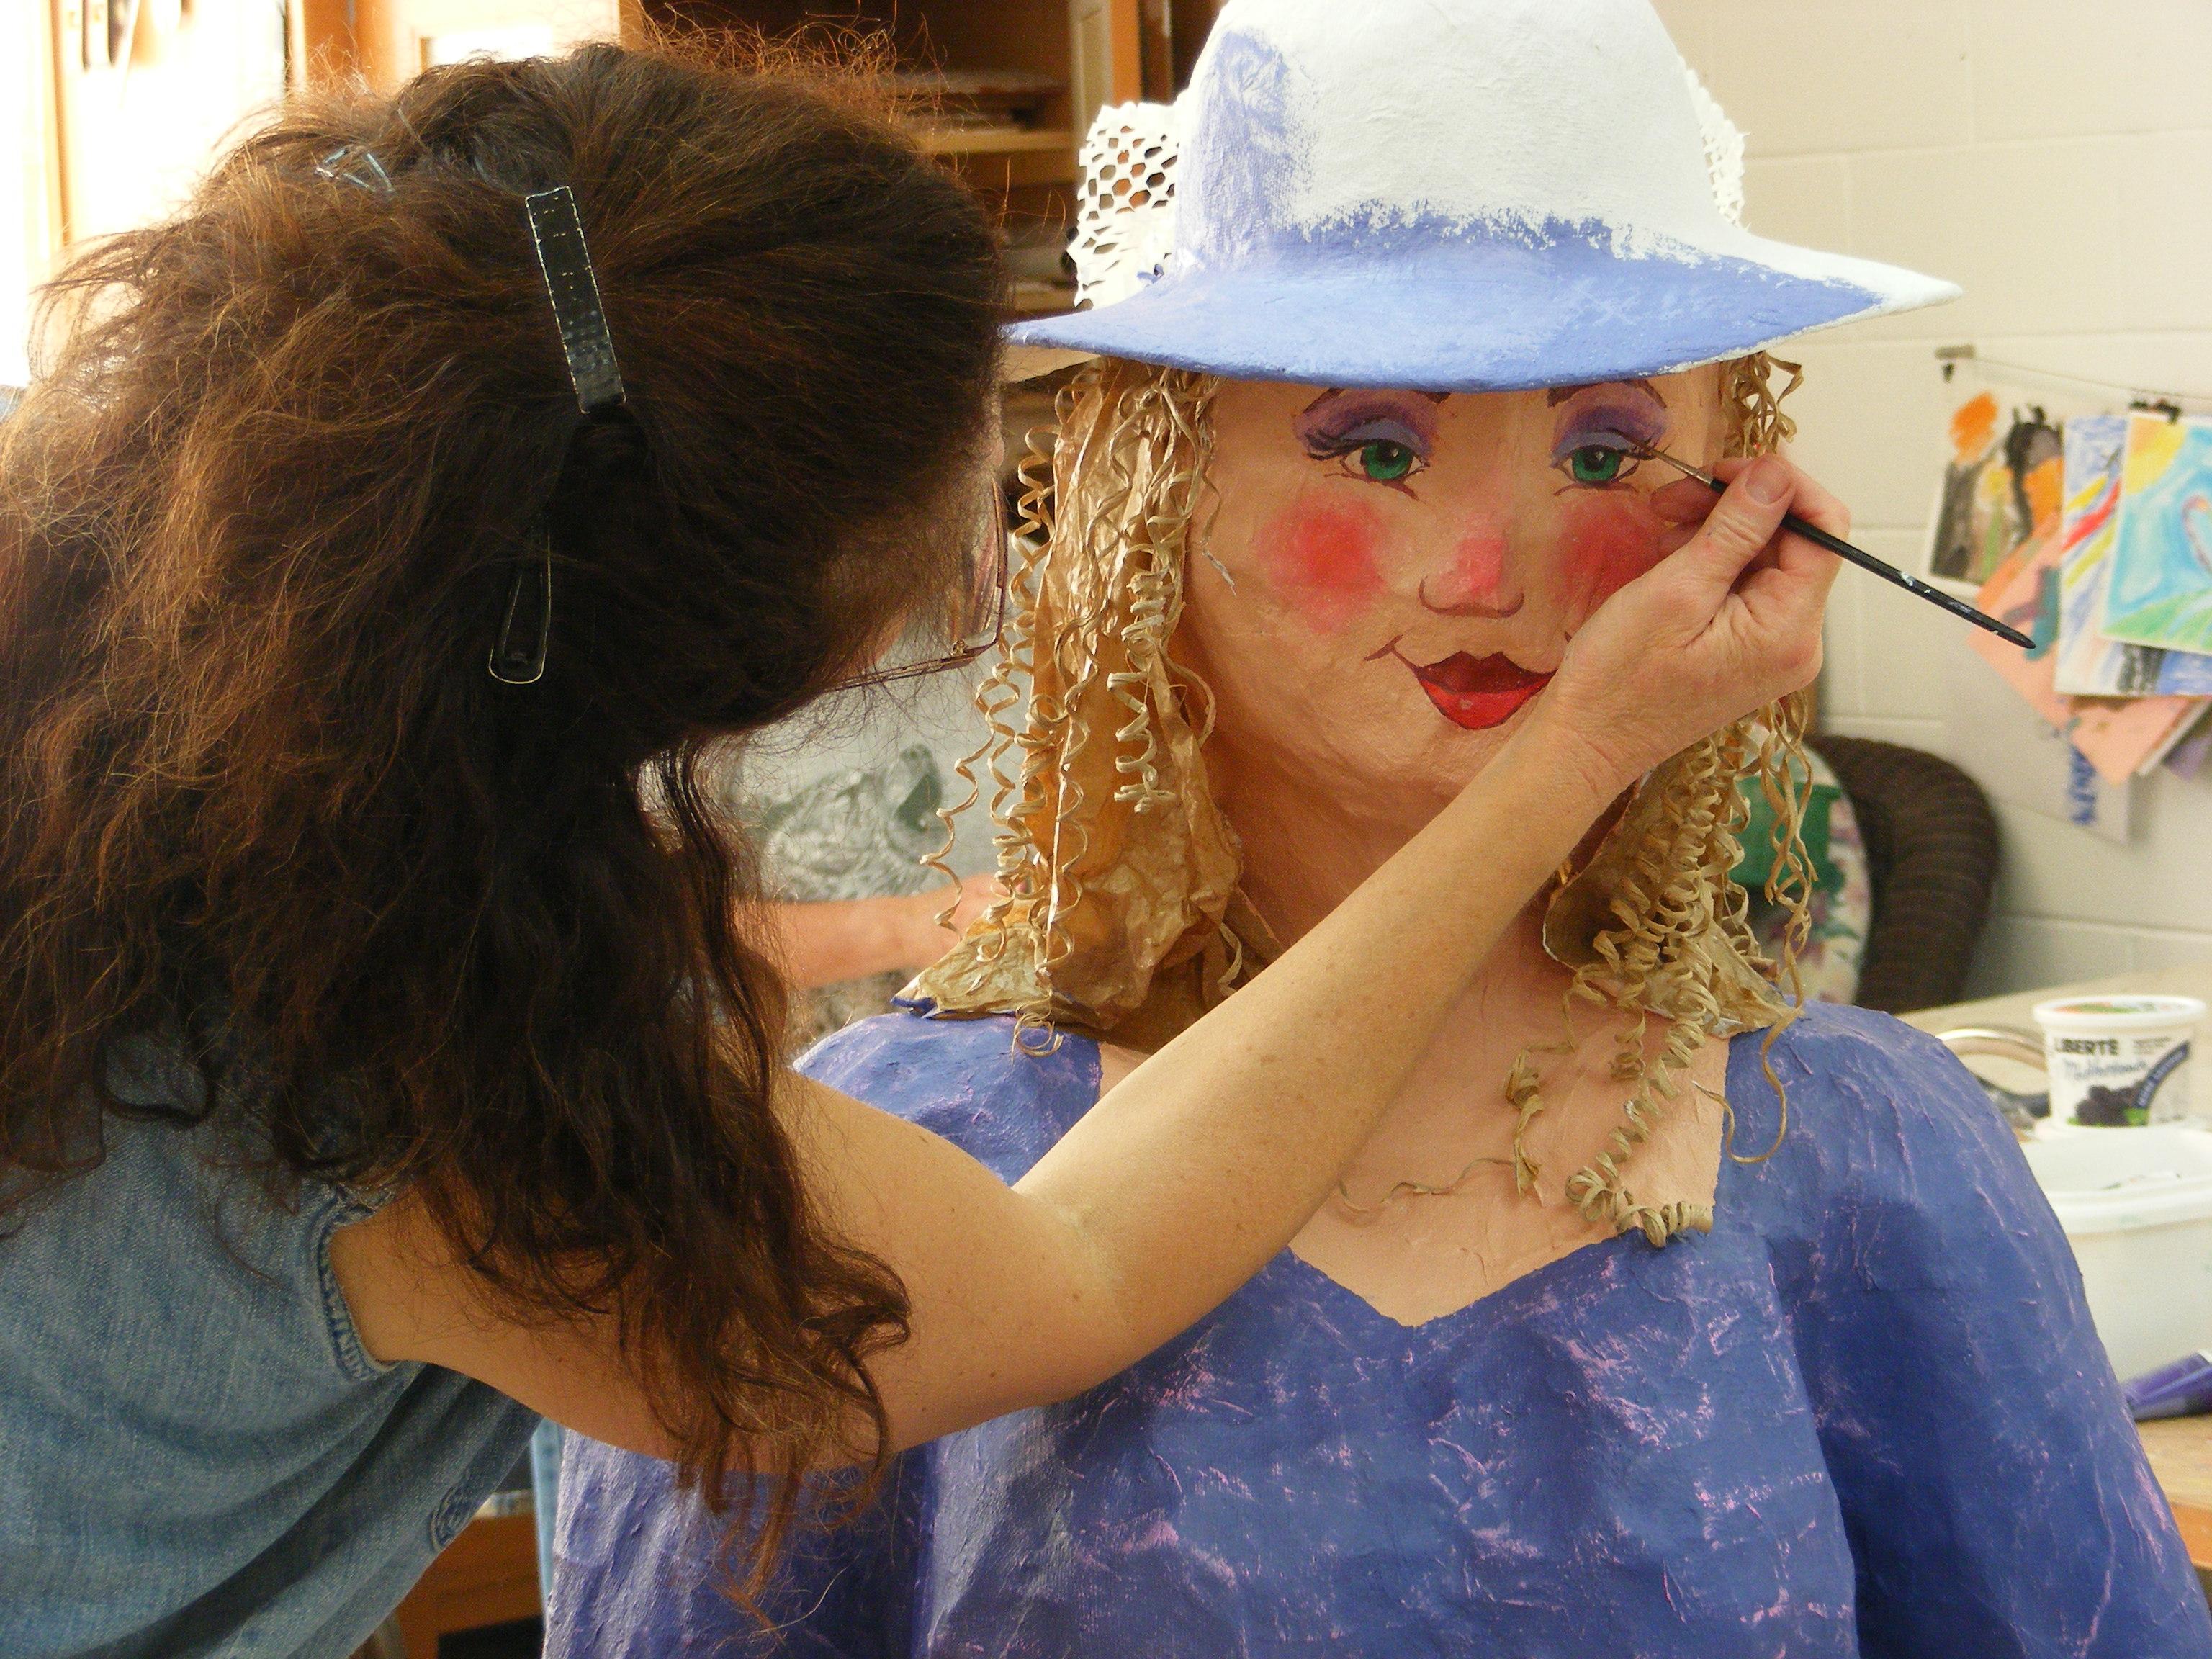 annabelle+makeup.JPG